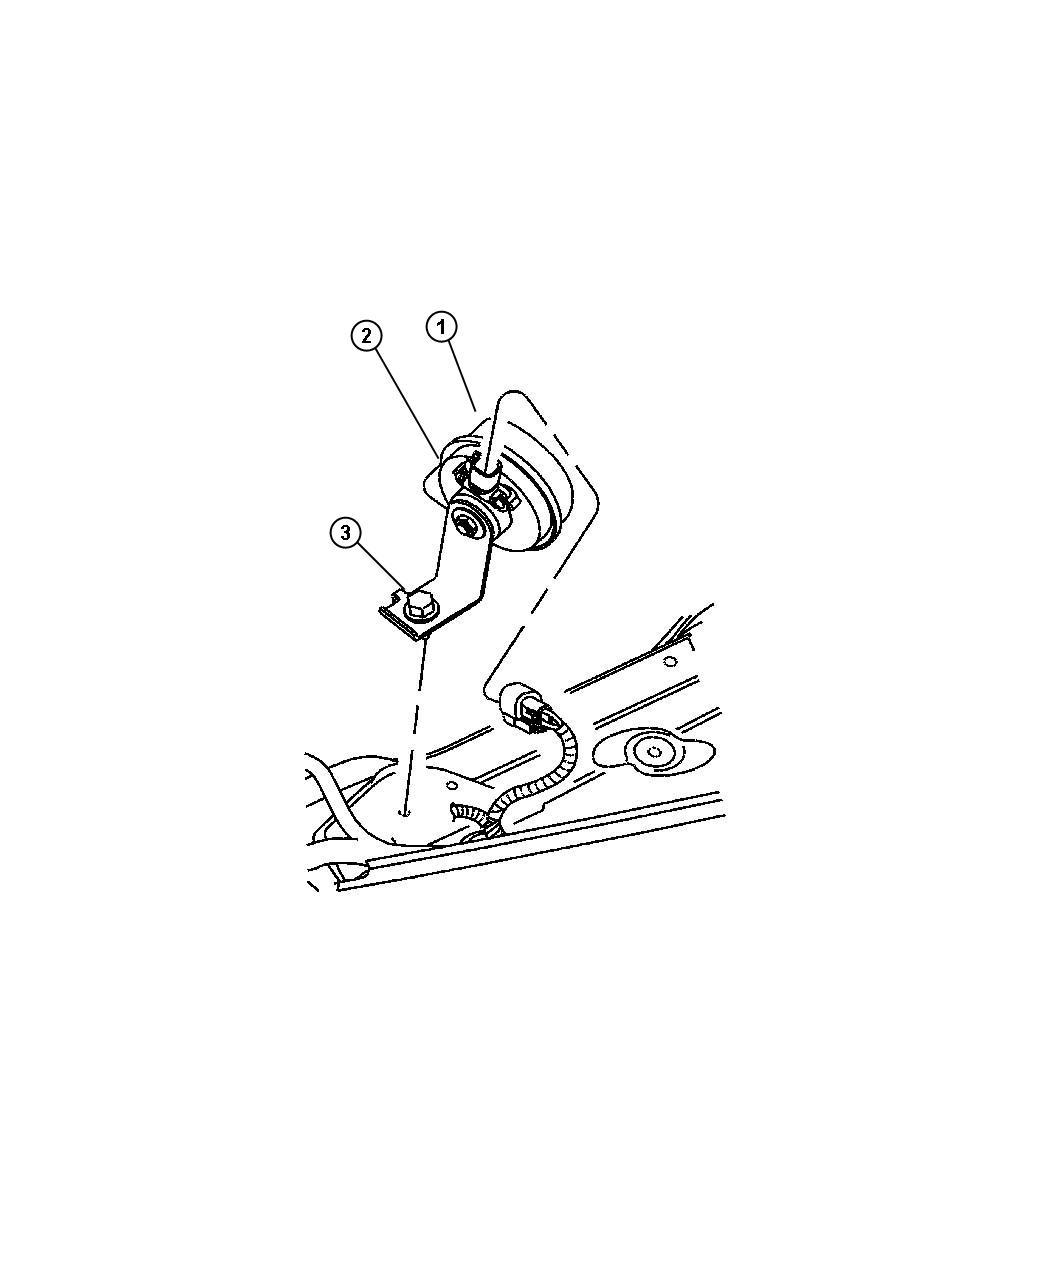 jeep serpentine belt diagram for mopar